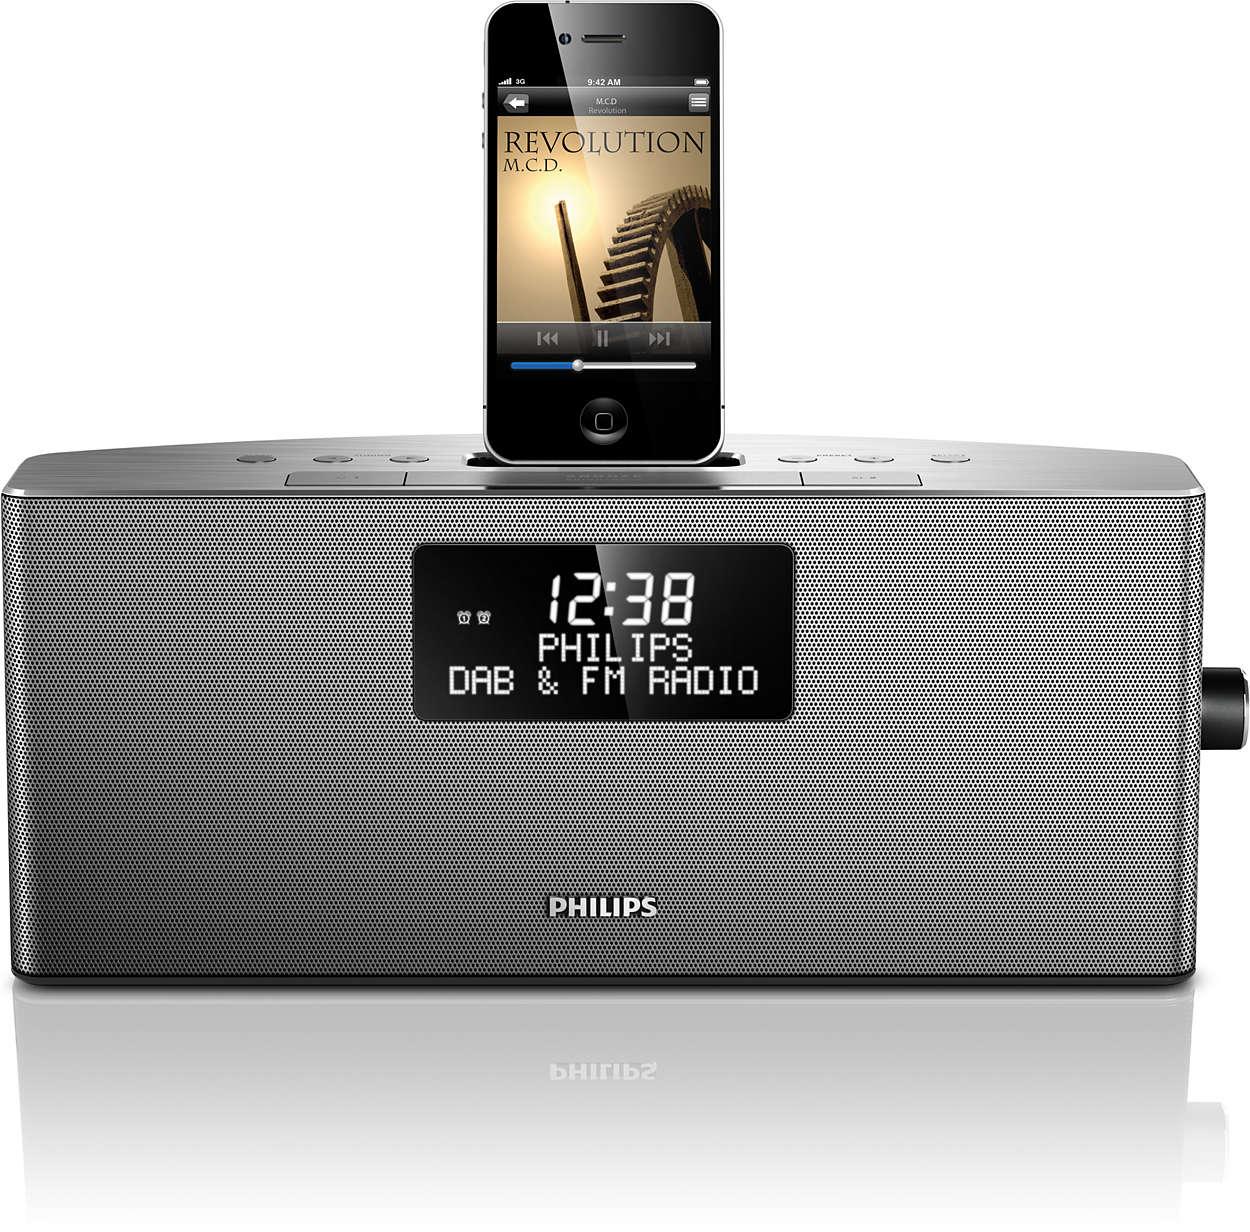 Vychutnejte si hudbu ziPodu/iPhonu arádia DAB+